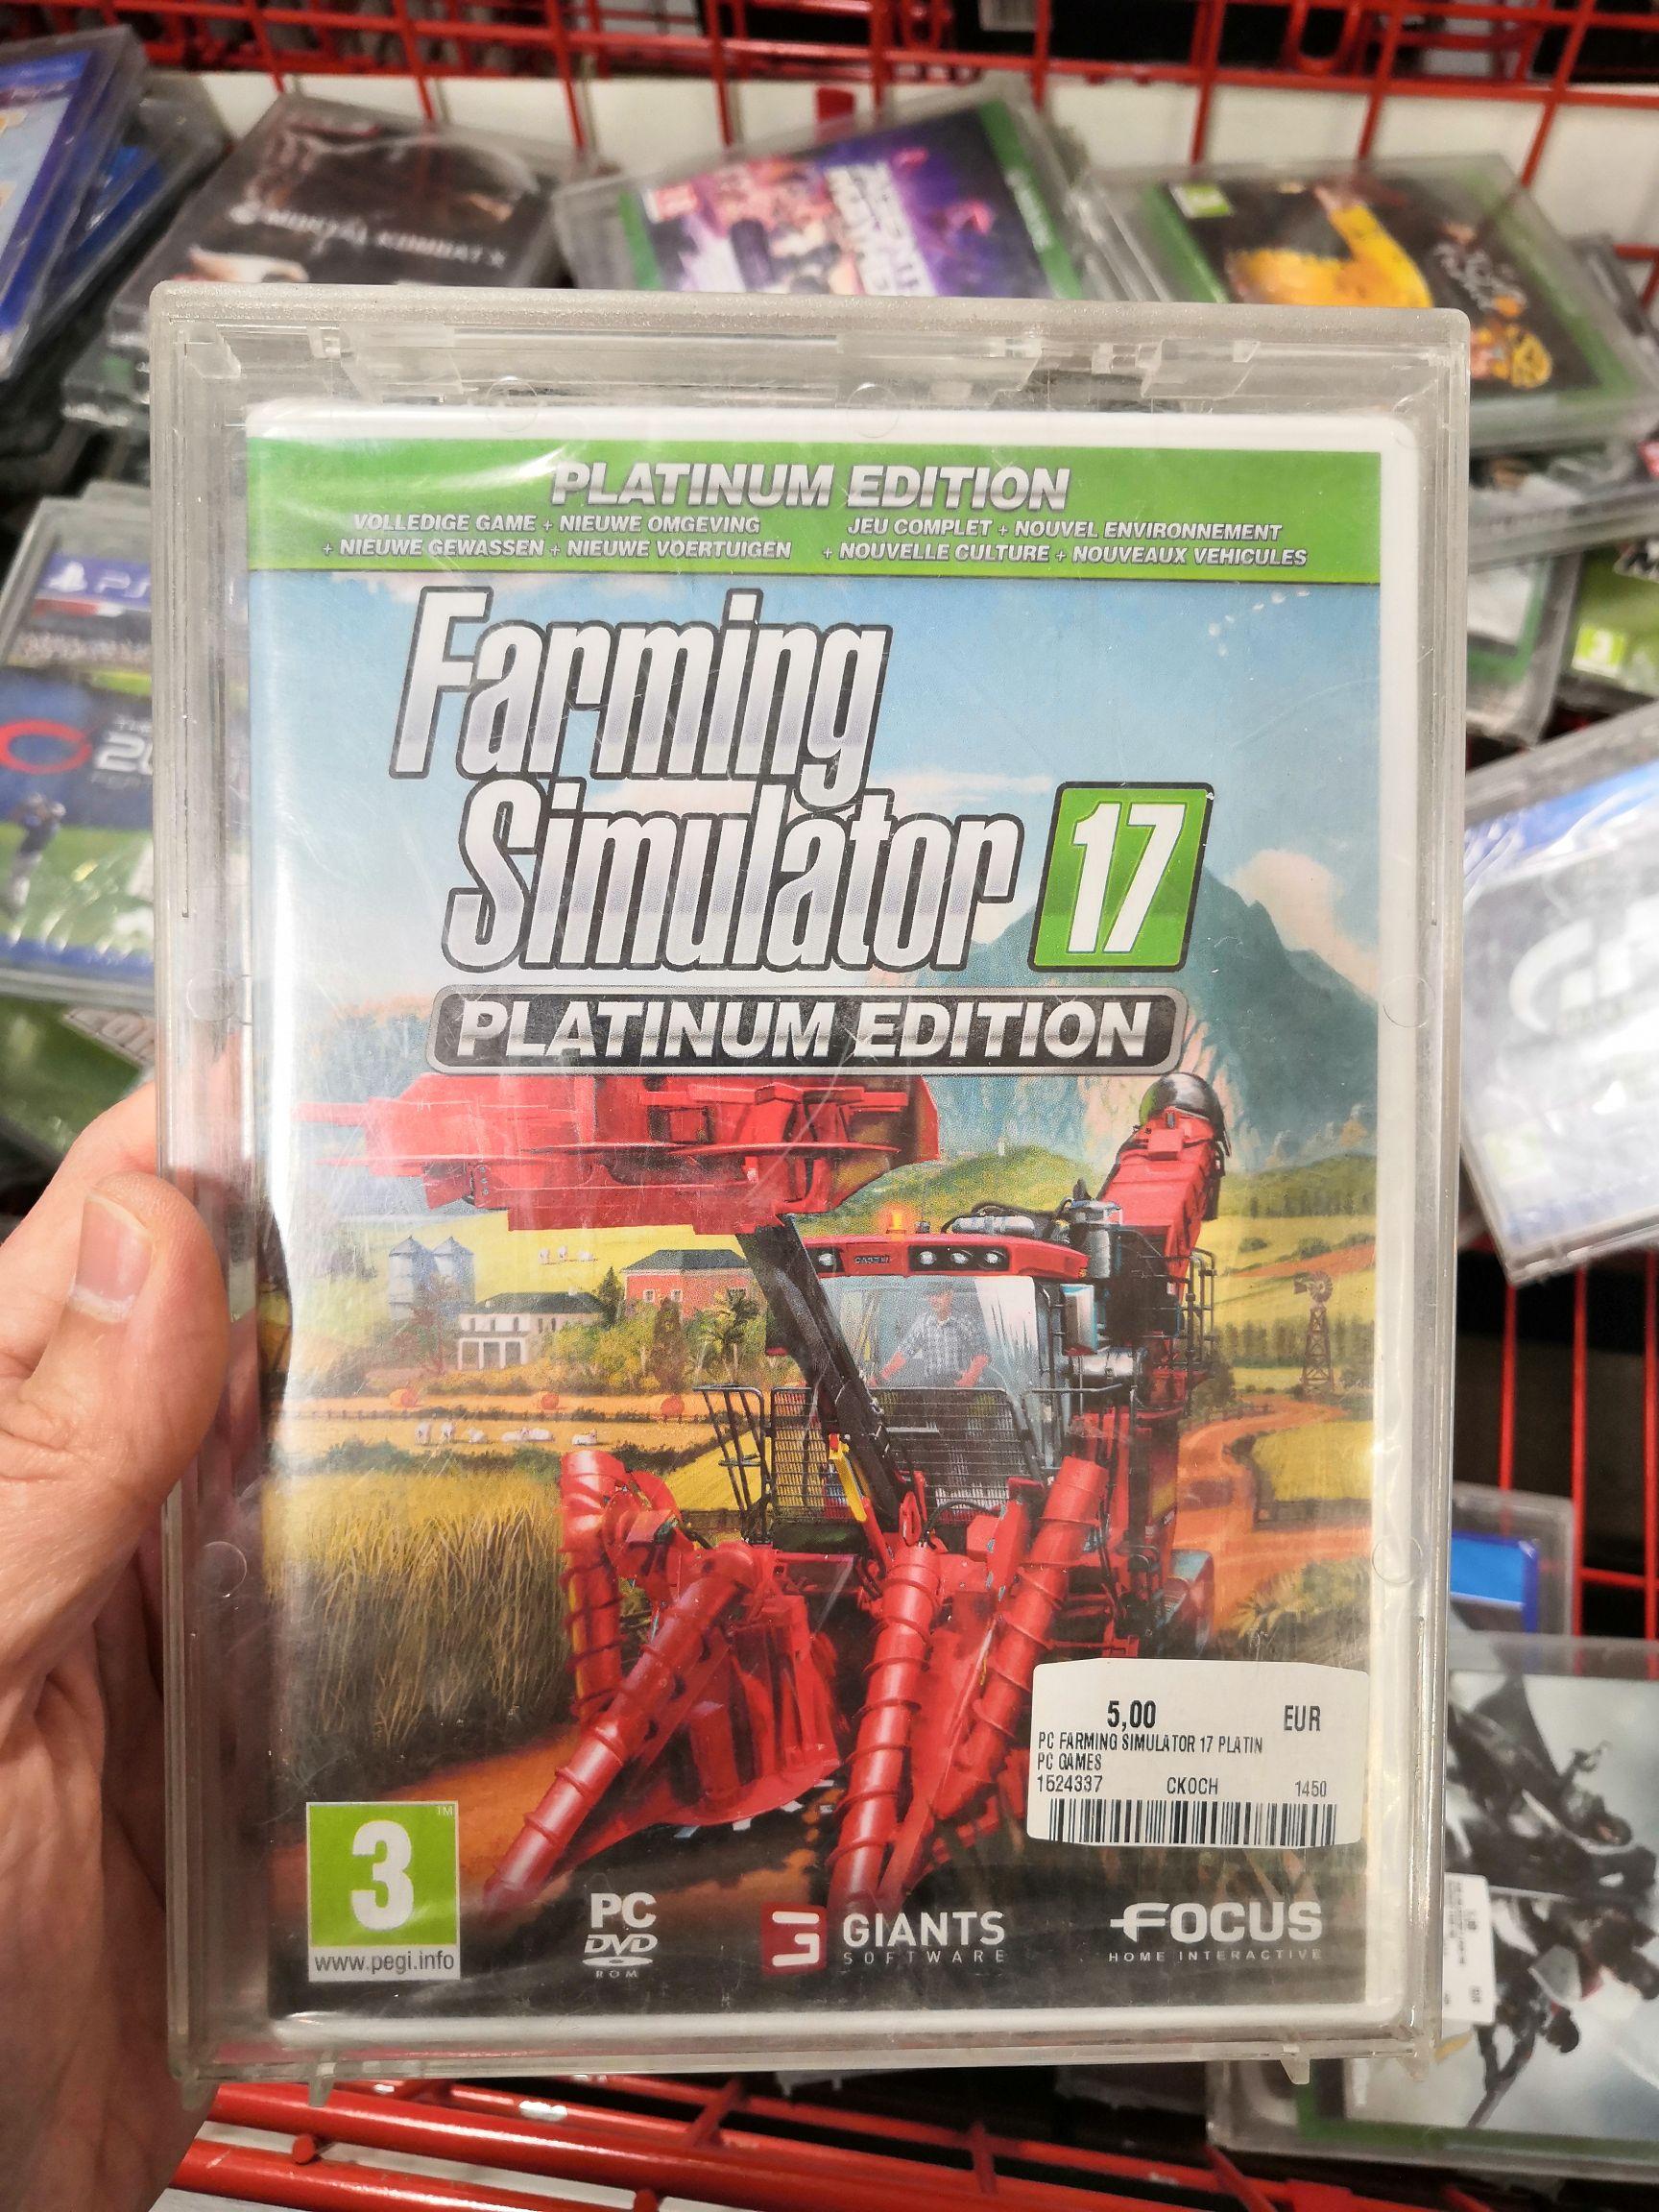 Farming Simulator 17 PC (lokaal?)